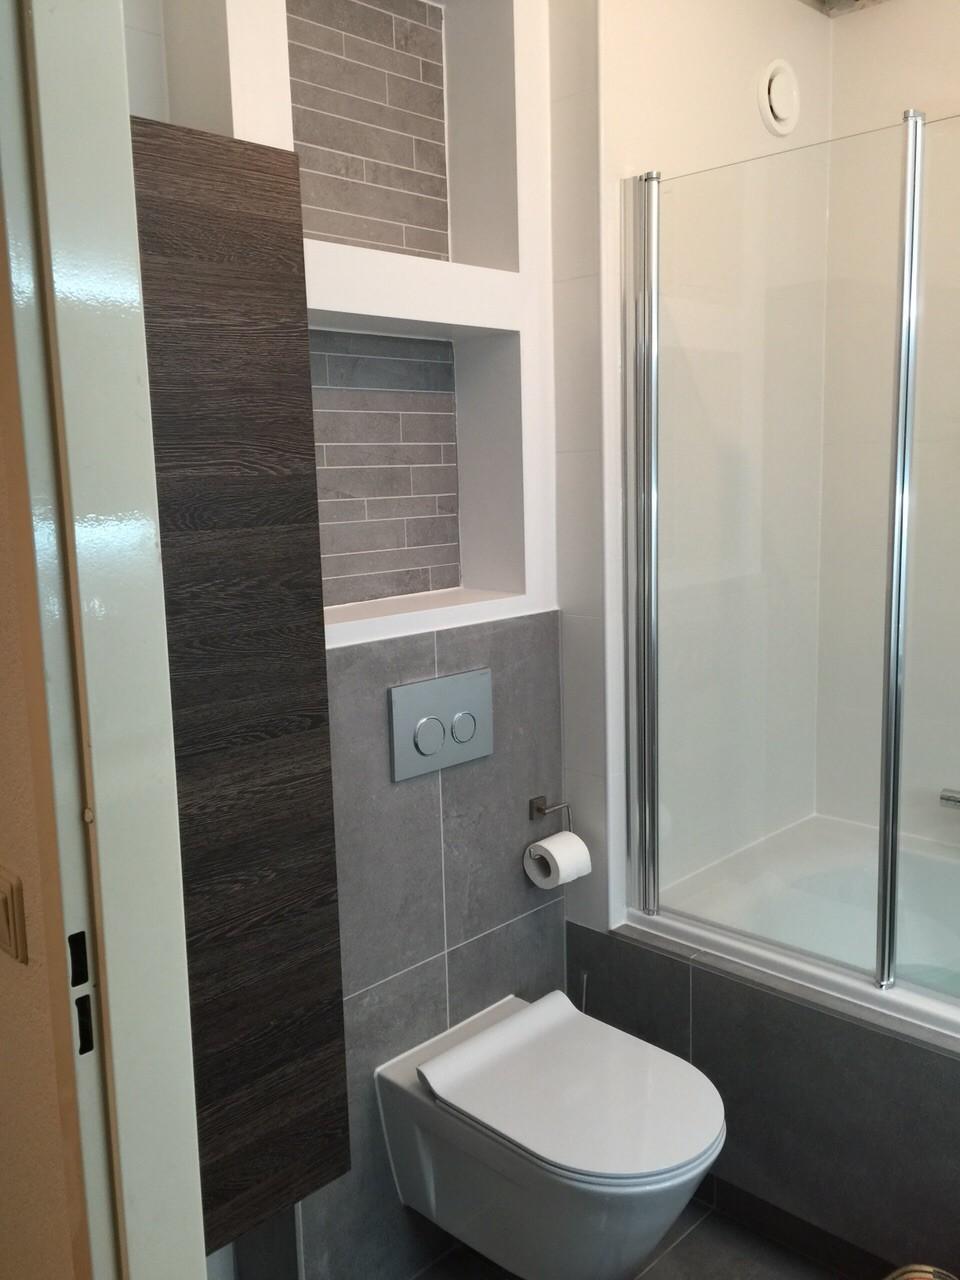 Wooning   keukens   badkamers   tegels   vloeren 62 ervaringen ...